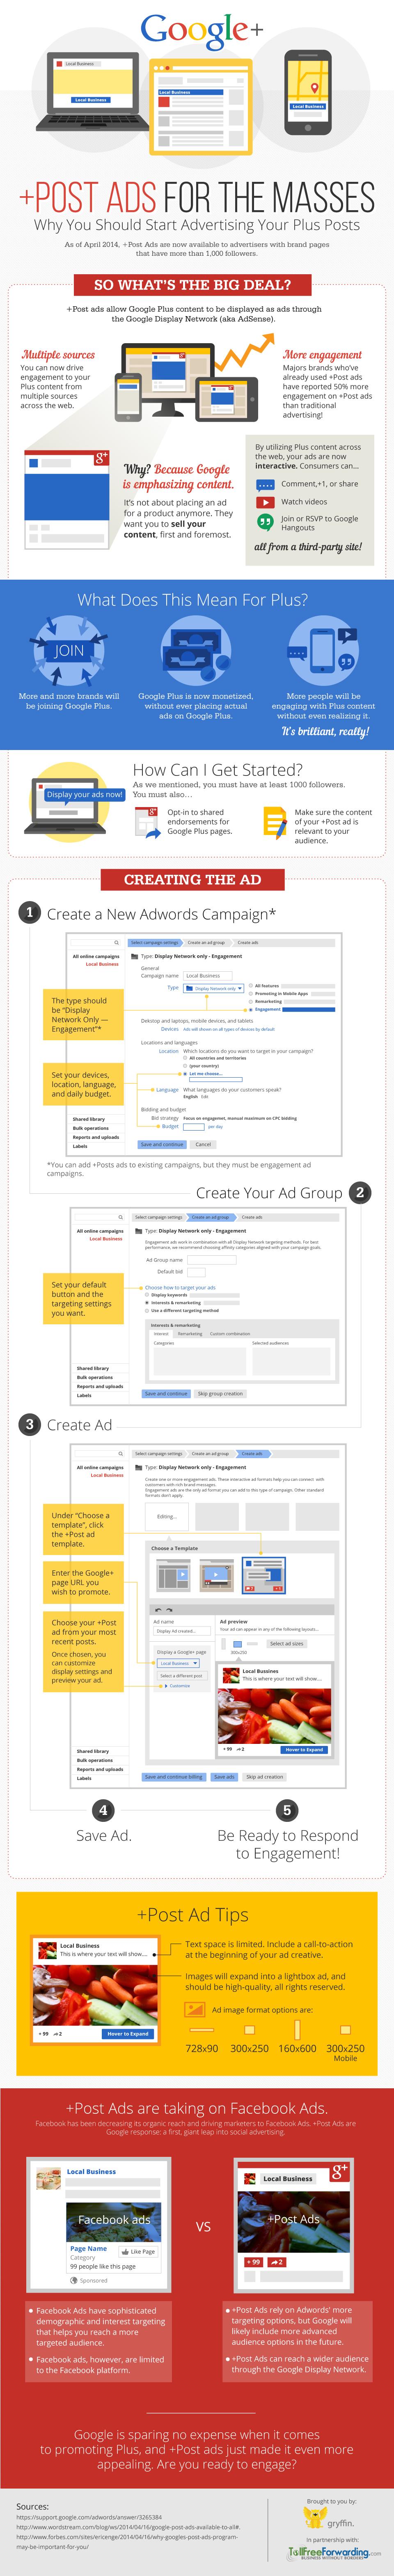 Google PostAds1